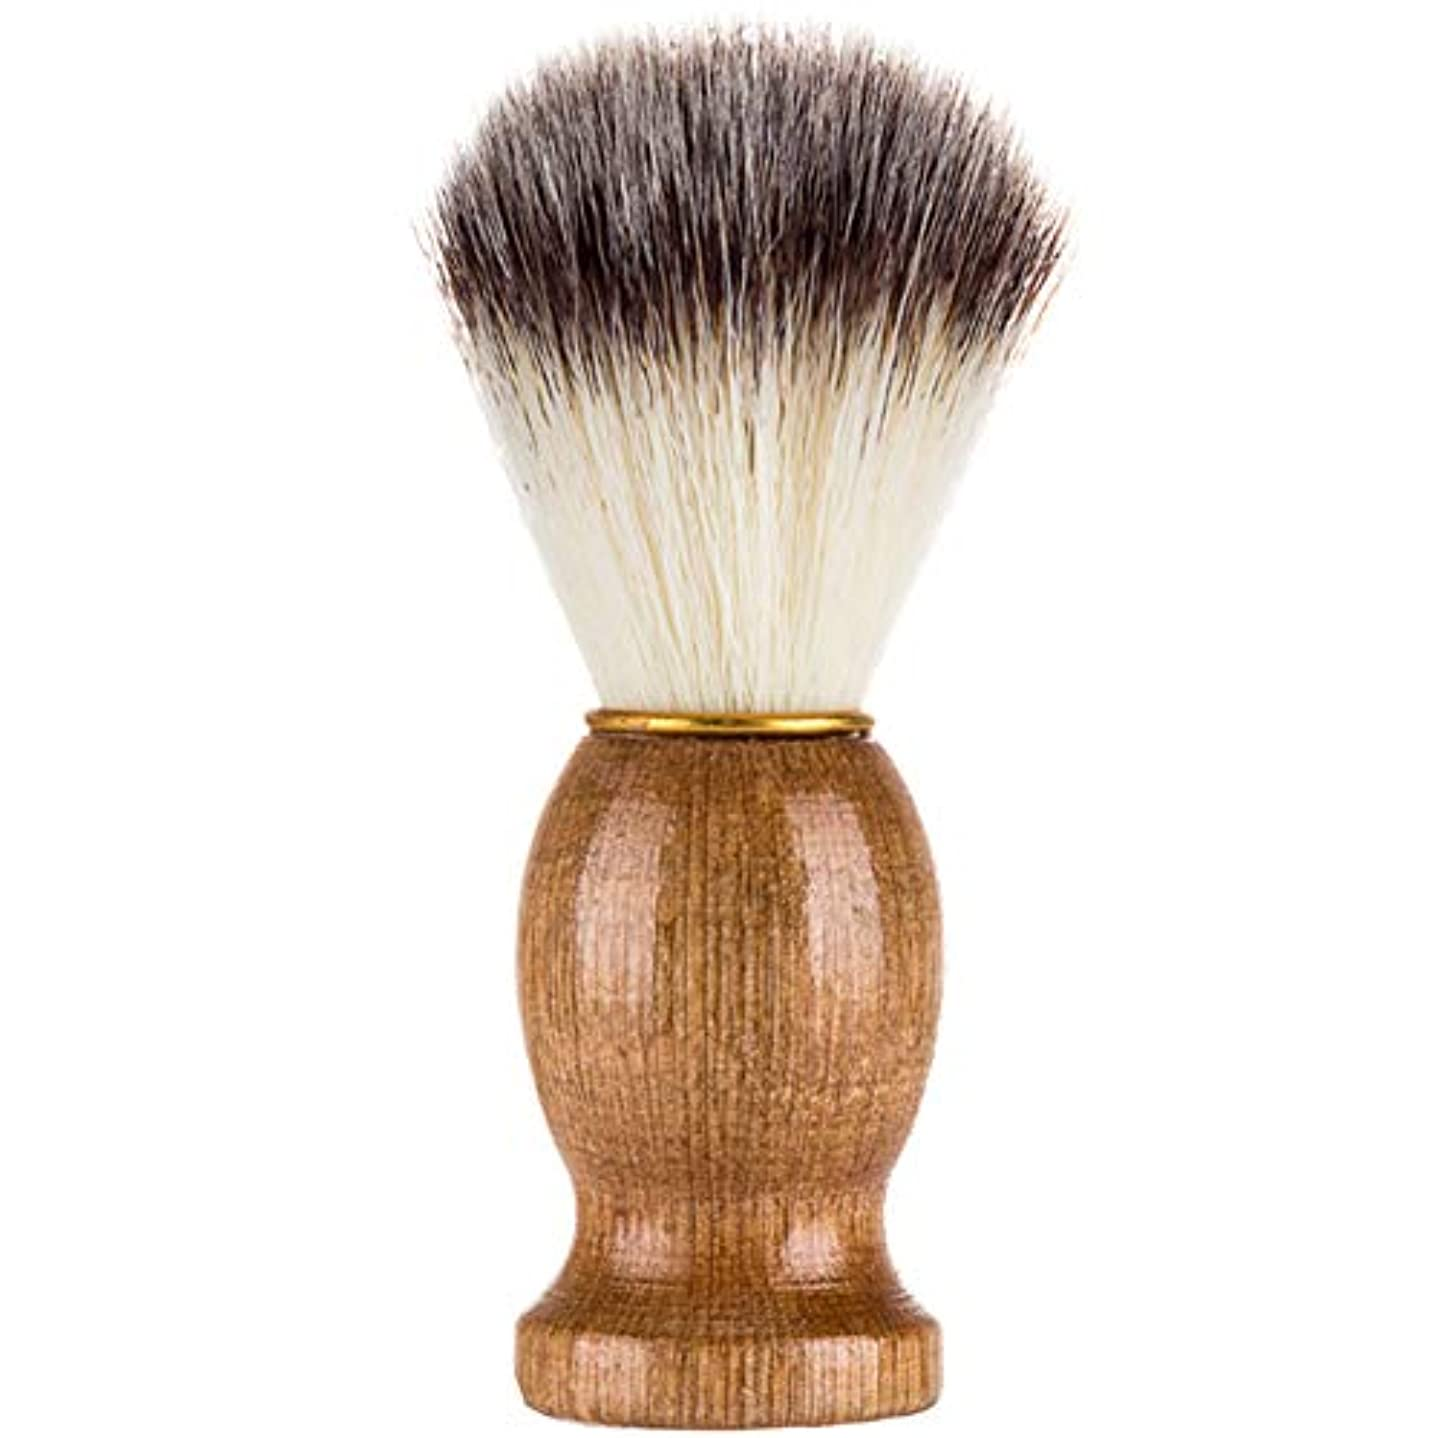 Xlp シェービングブラシ、シェービングブラシ、男性シェービングブラシシェービングかみそりブラシサロン理髪店用ツールひげ剃り用品